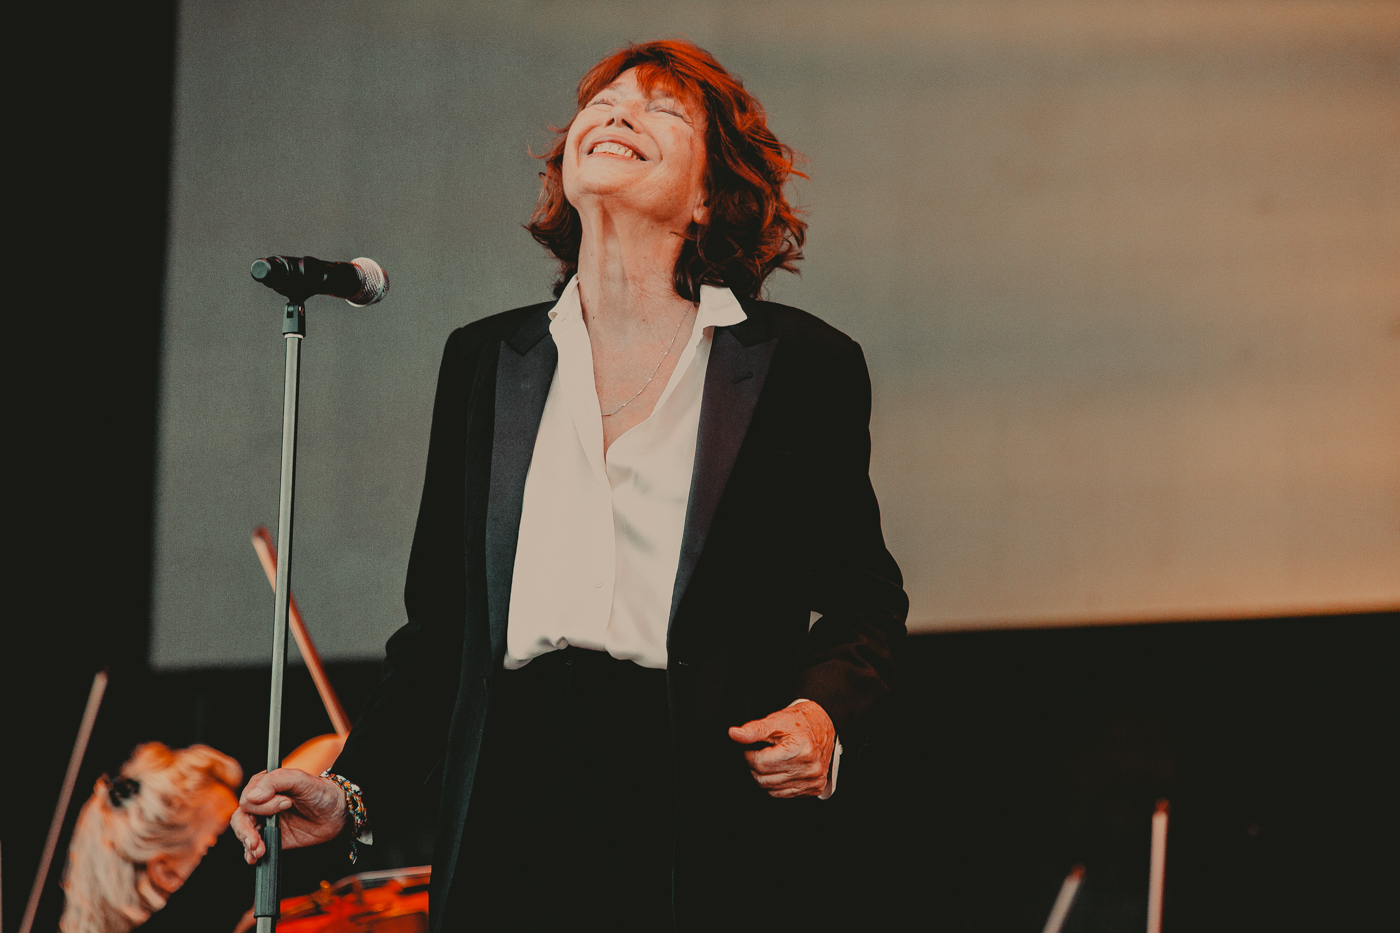 Jane Birkin, photo by Kimberley Ross